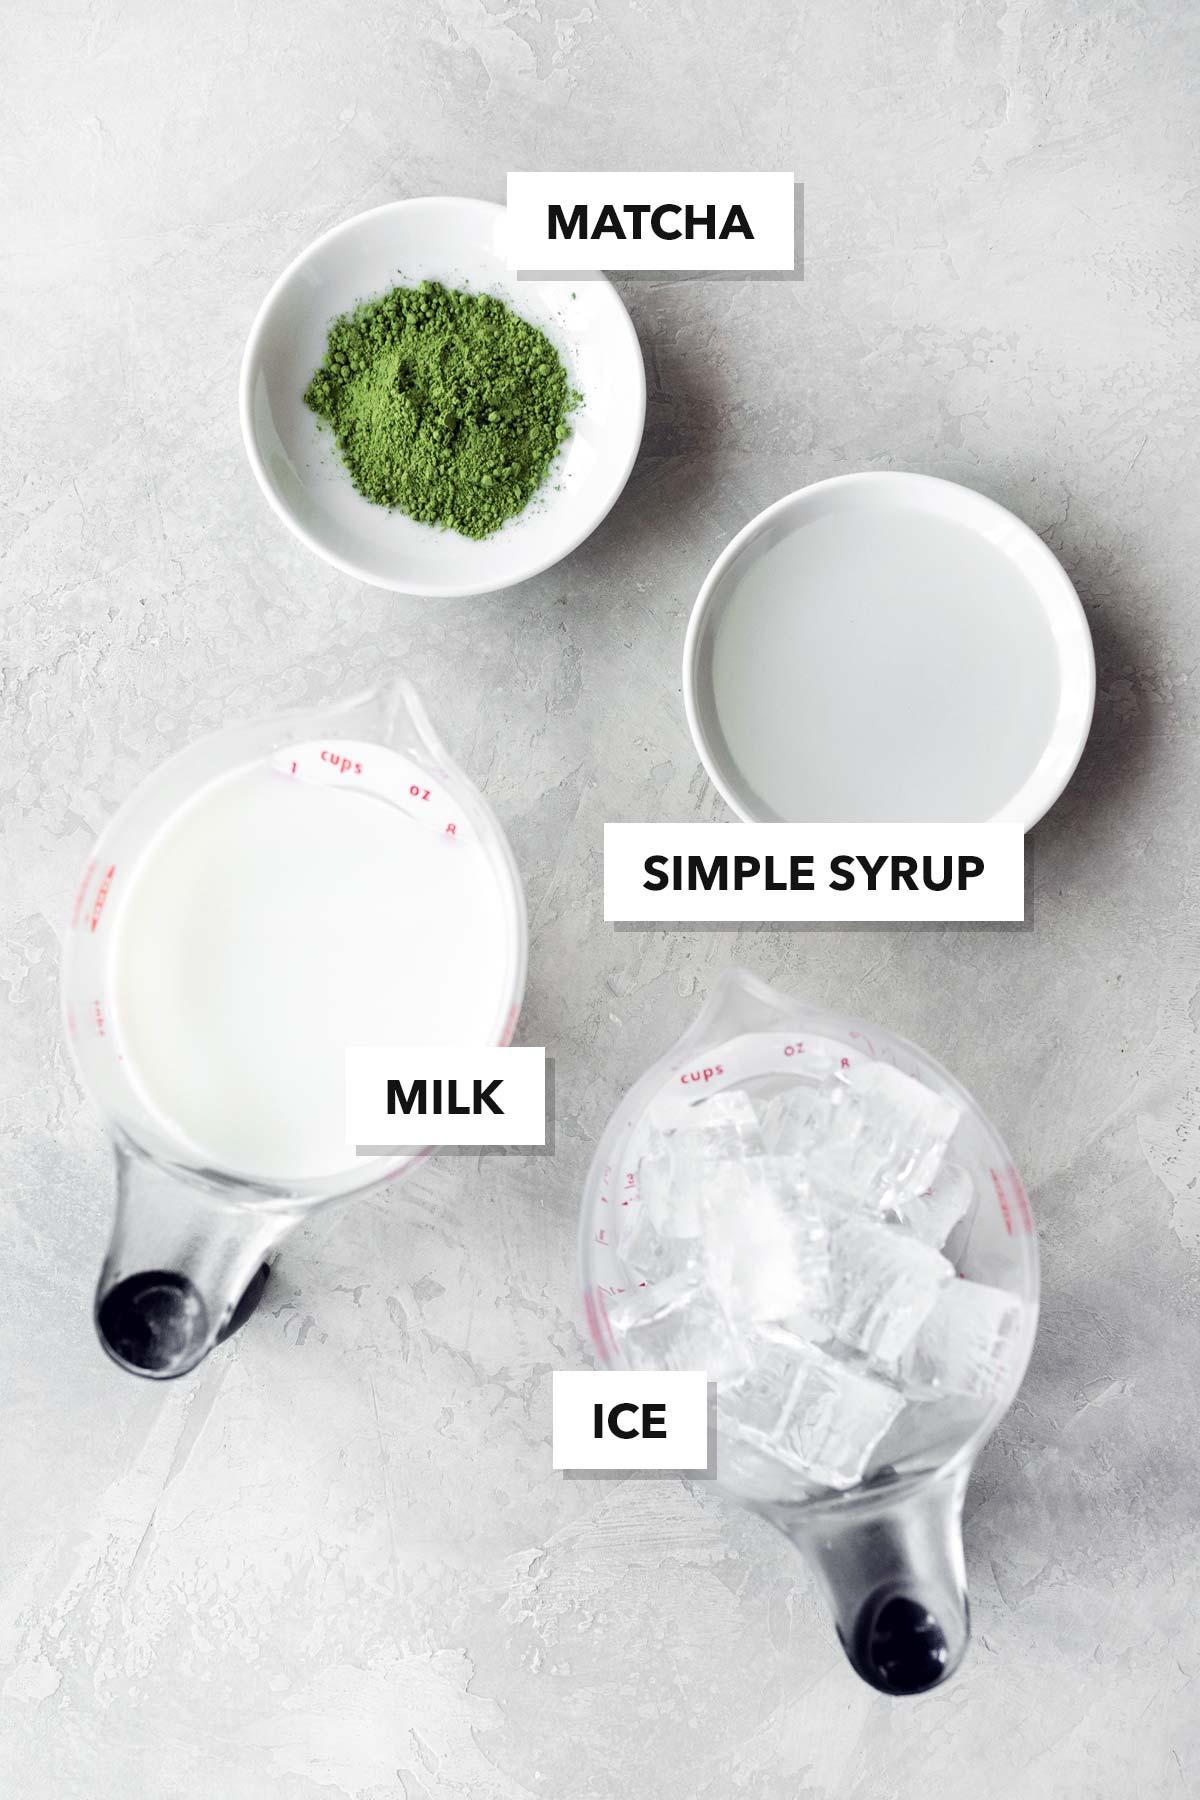 Starbucks Iced Matcha Latte copycat ingredients.